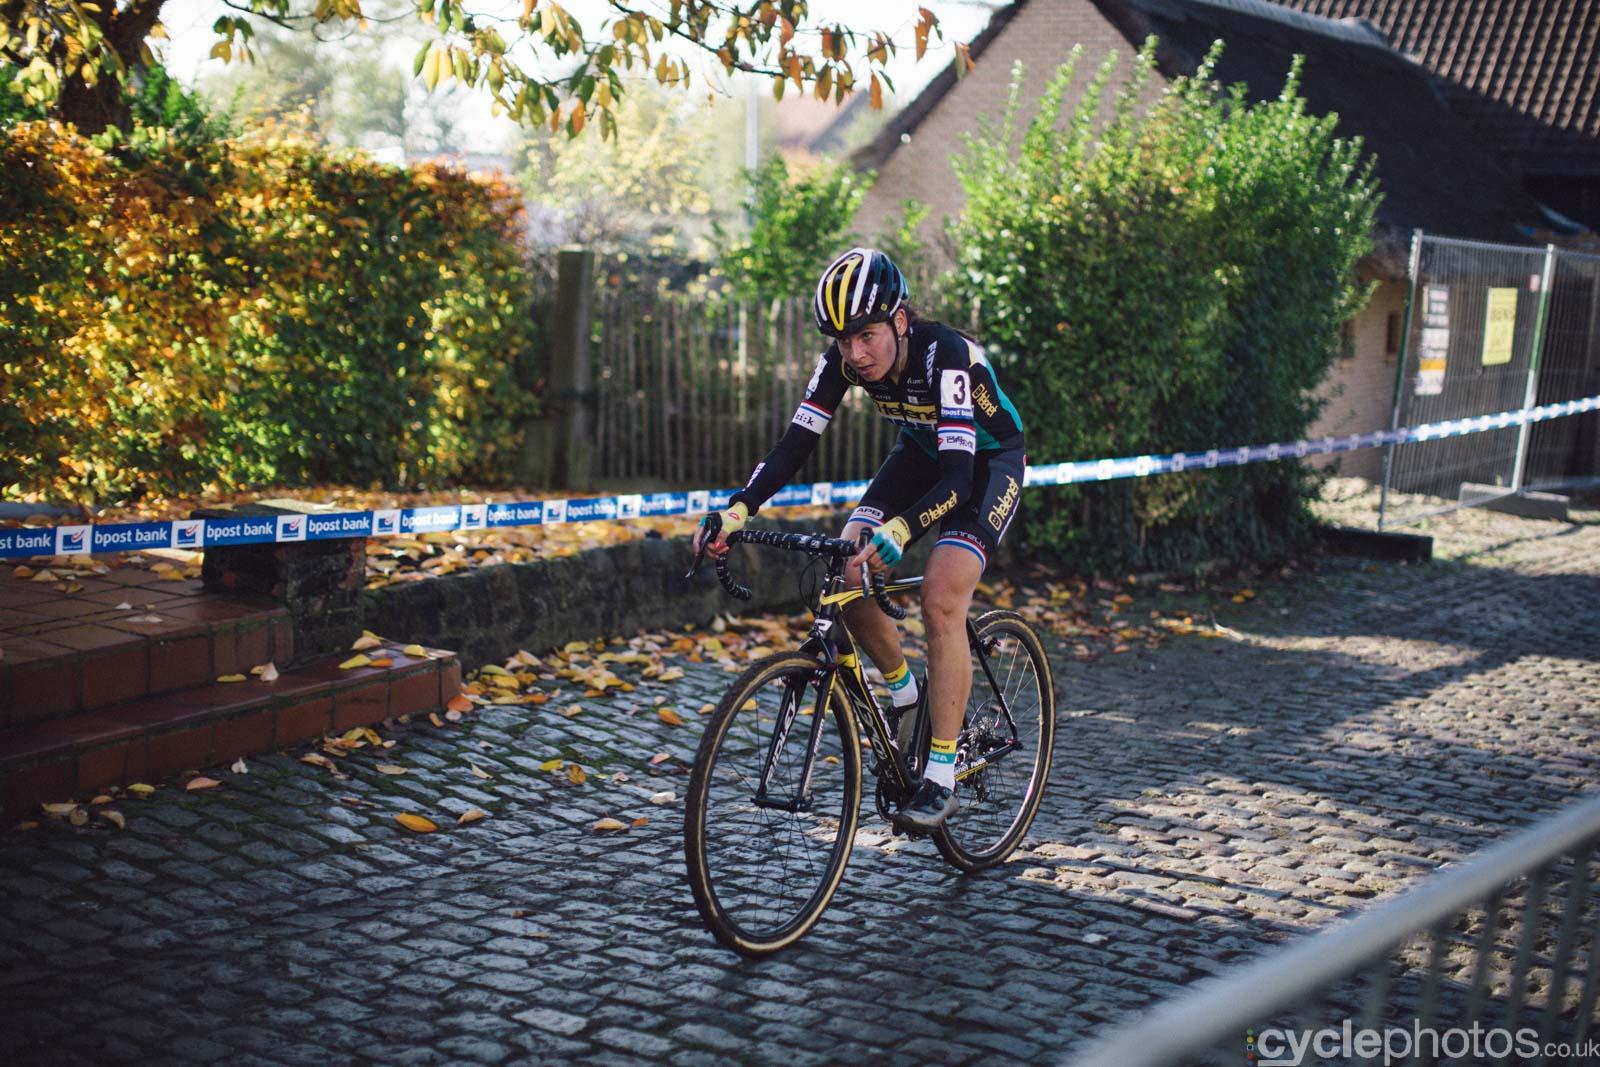 2015-cyclephotos-cyclocross-koppenberg-152204-nikki-harris